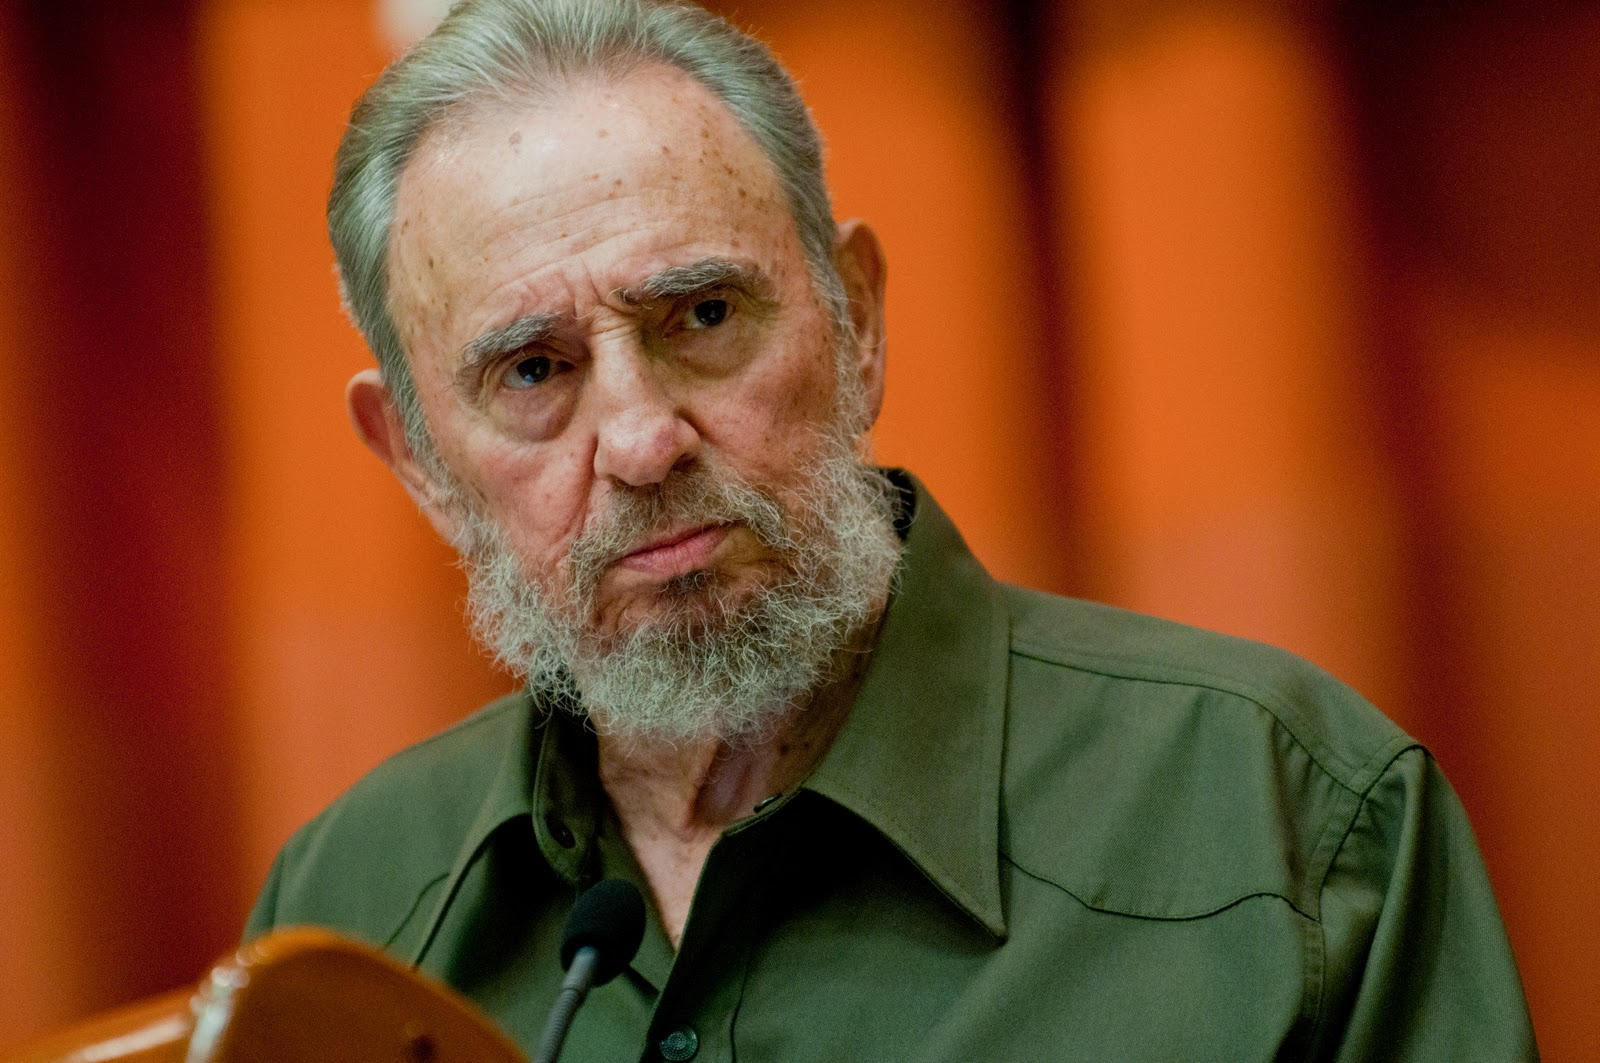 Images of Fidel Castro | 1600x1063